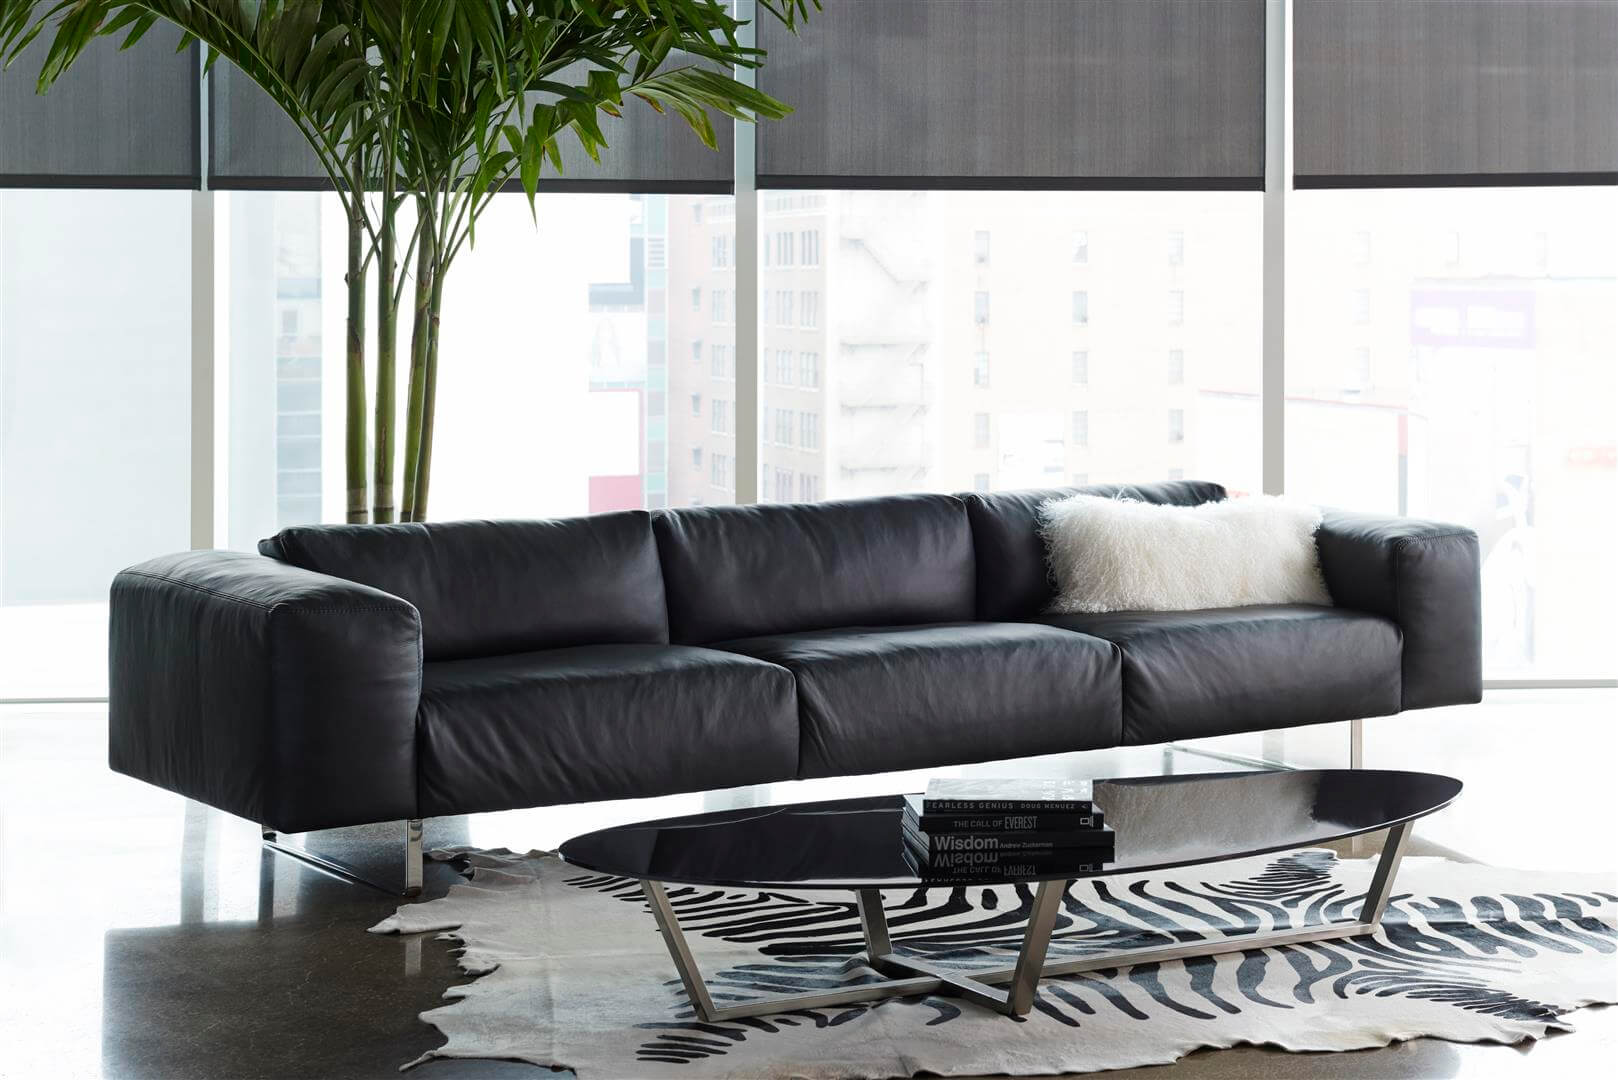 Clint_sofa